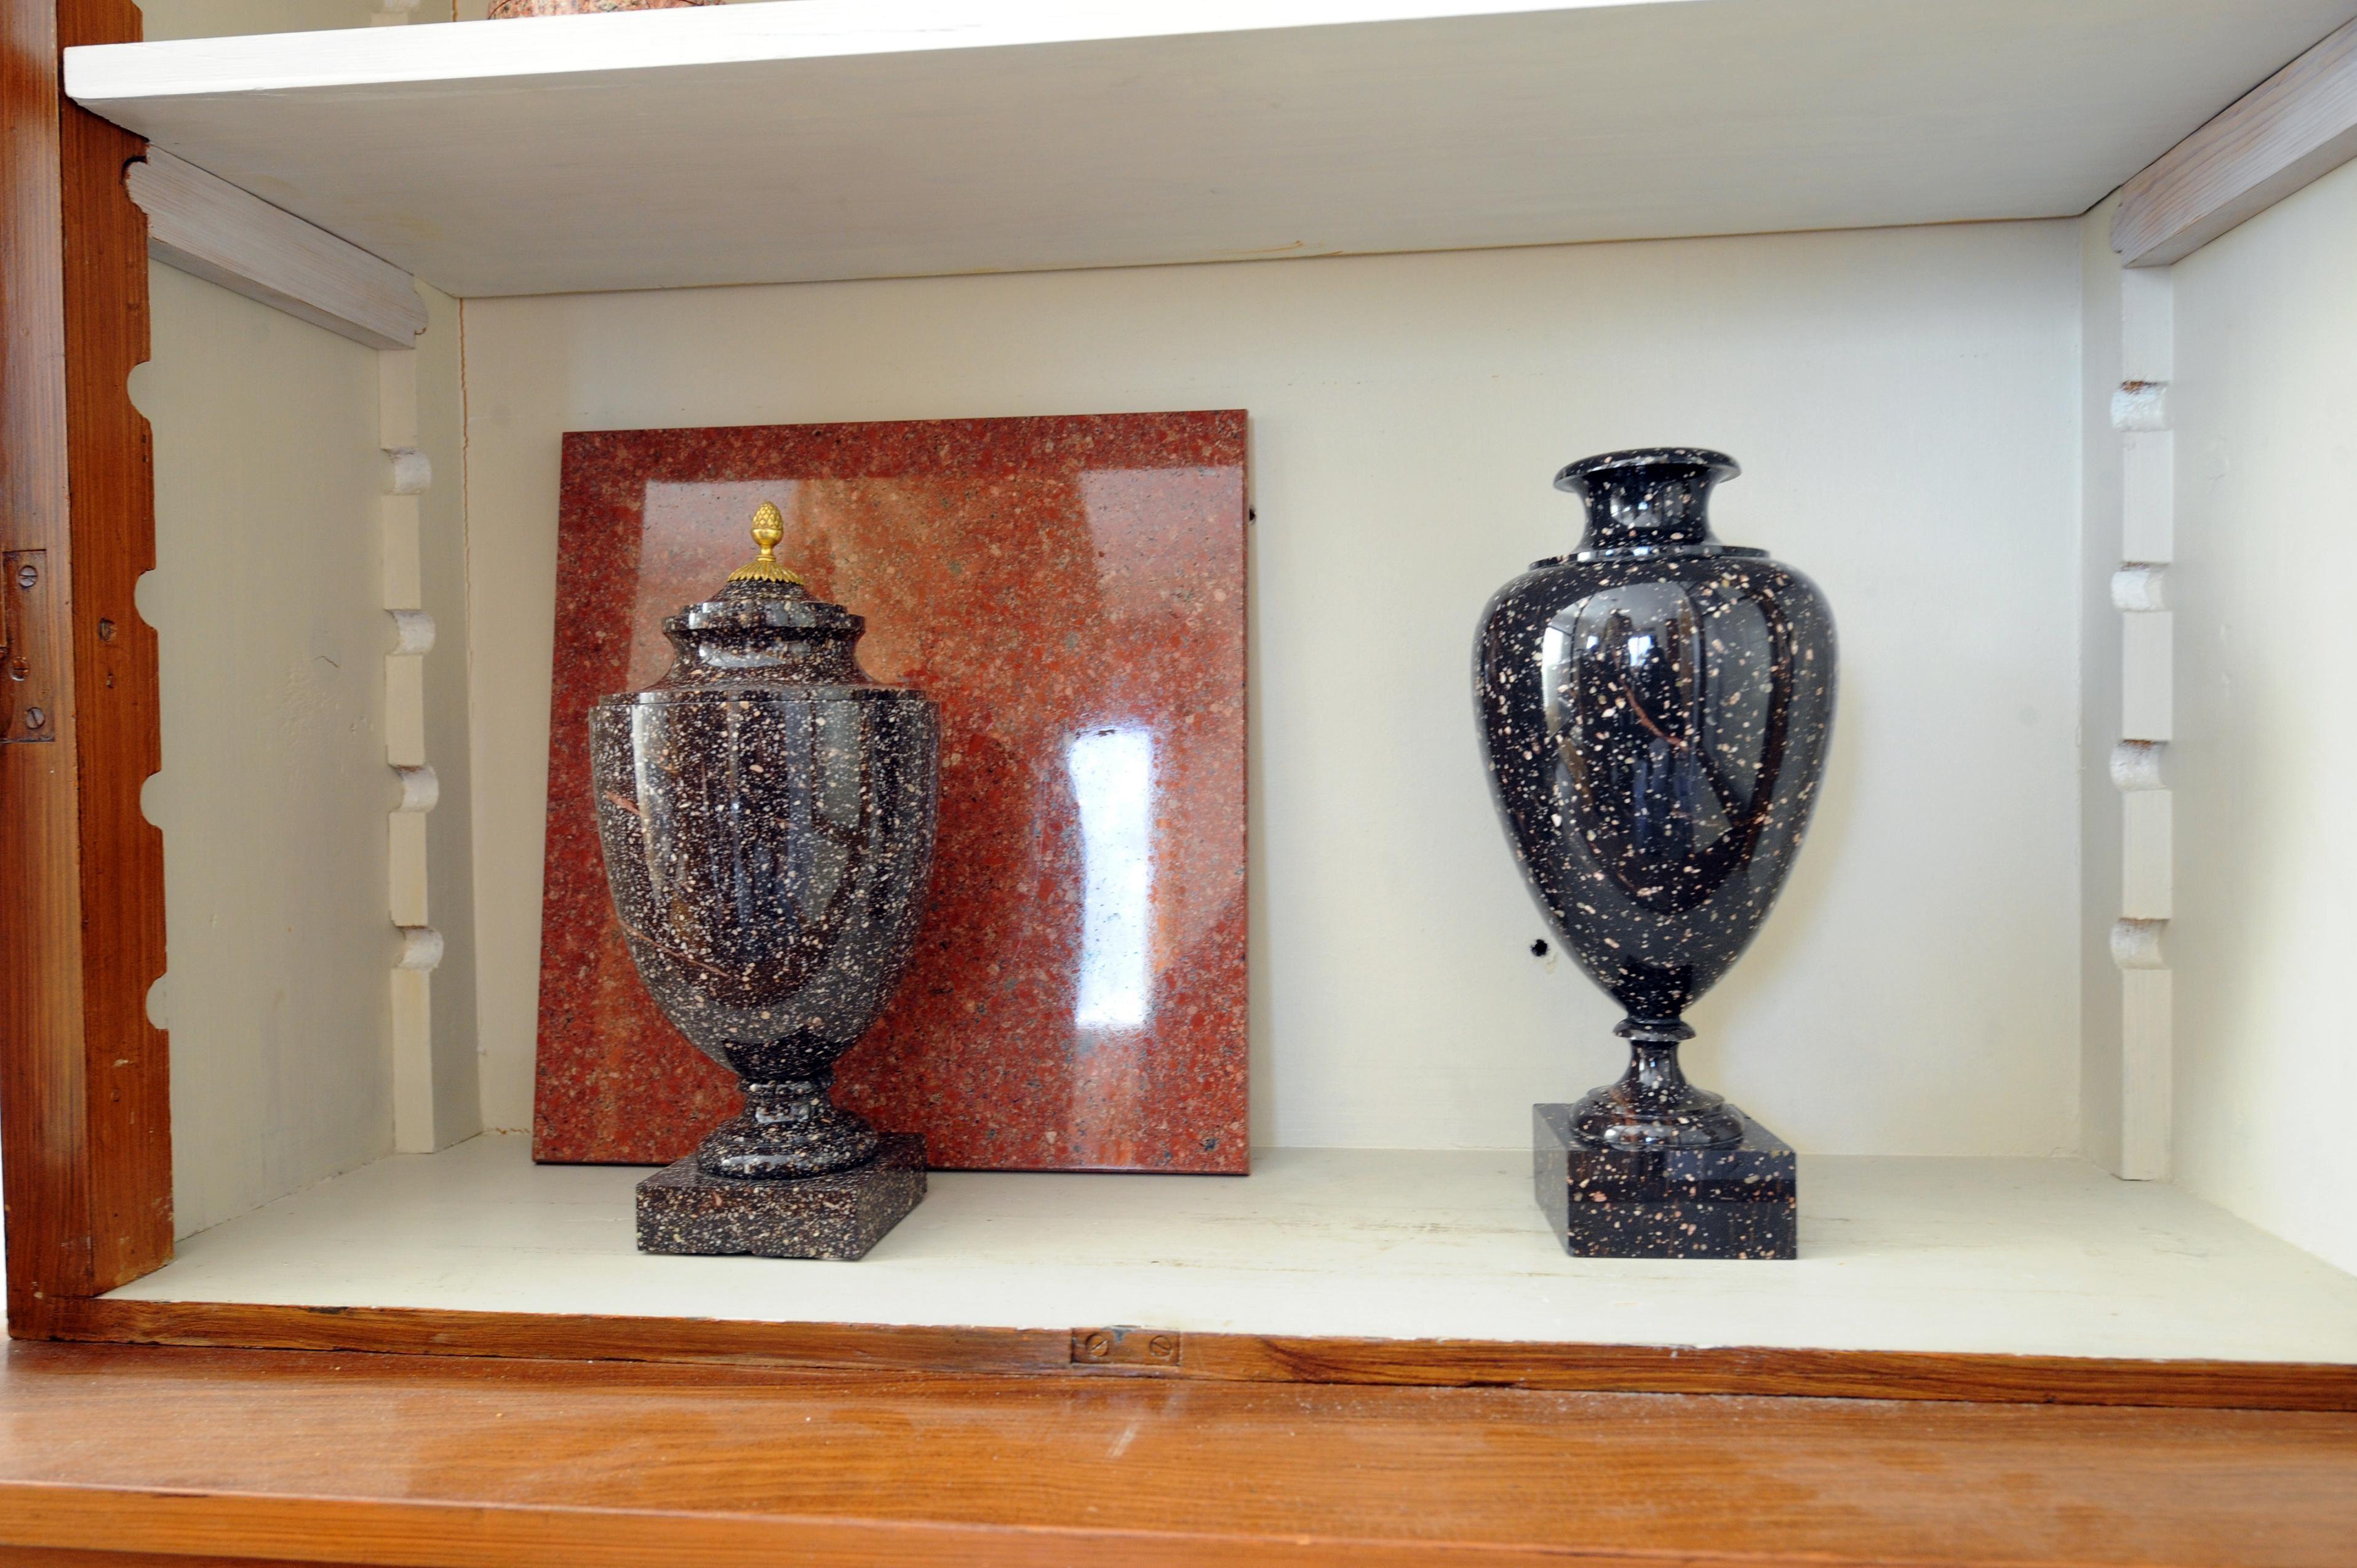 Porfyr- & Hagströmmuseet